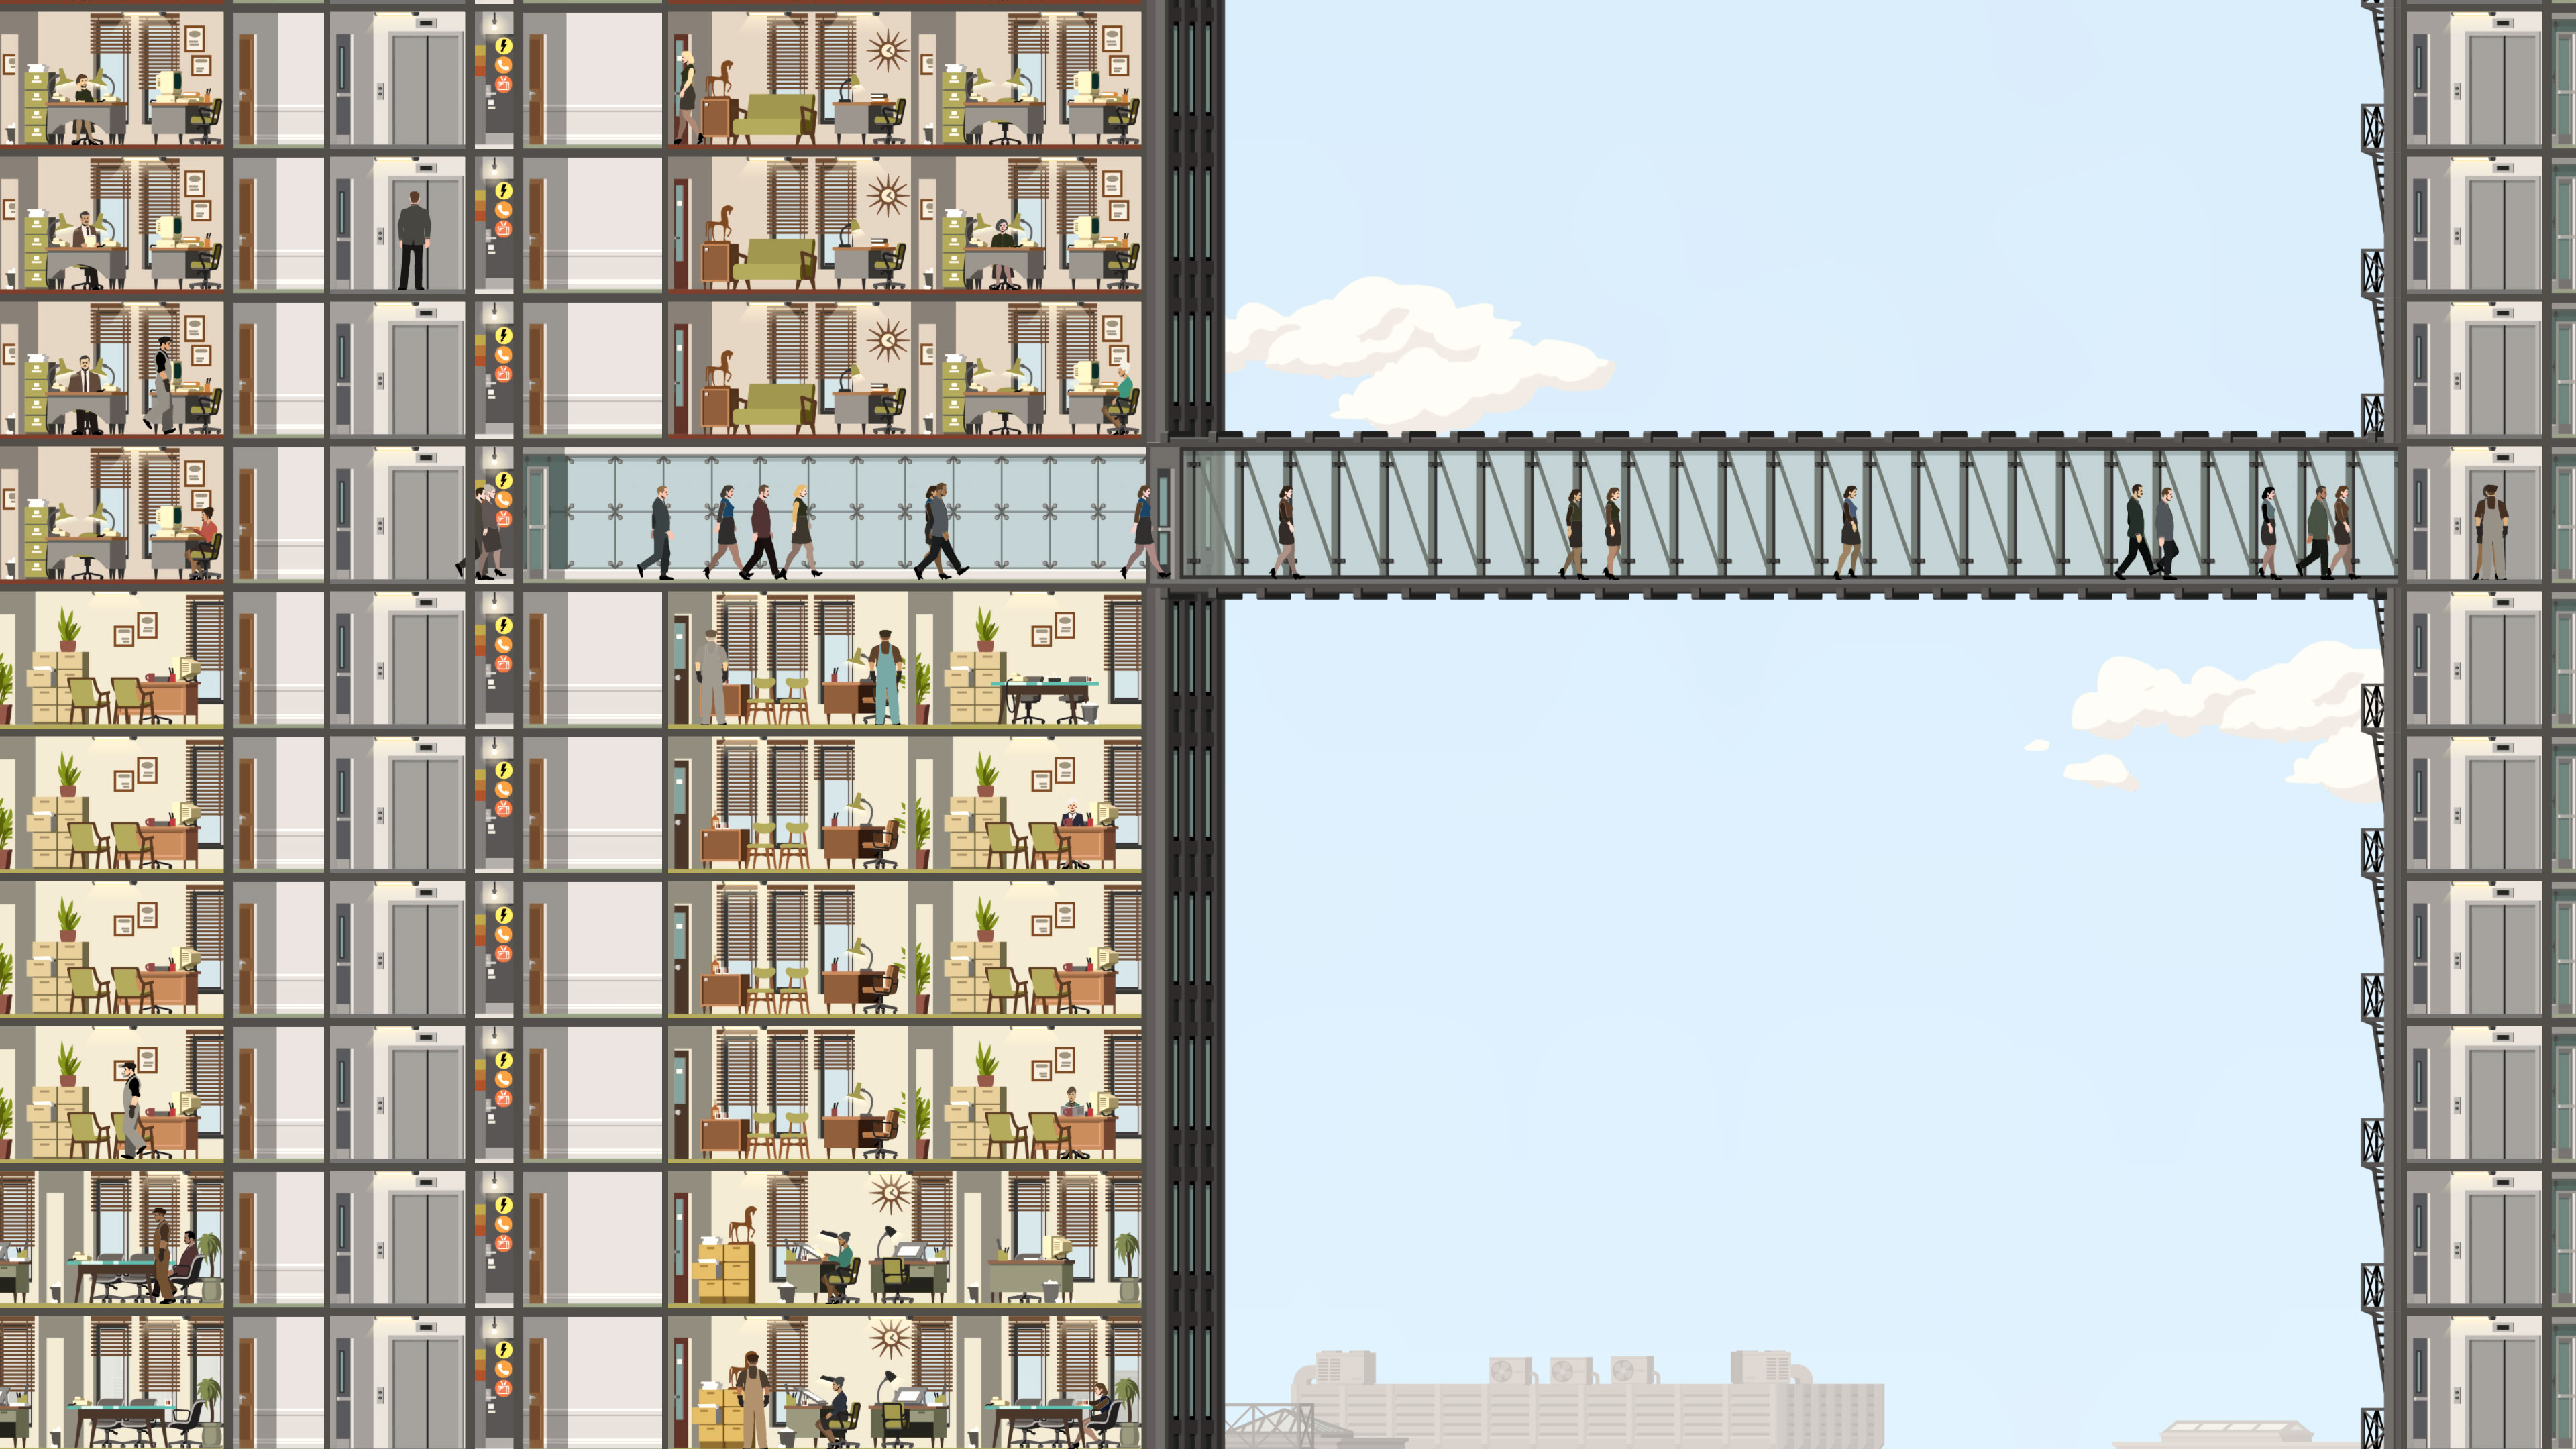 skybridges